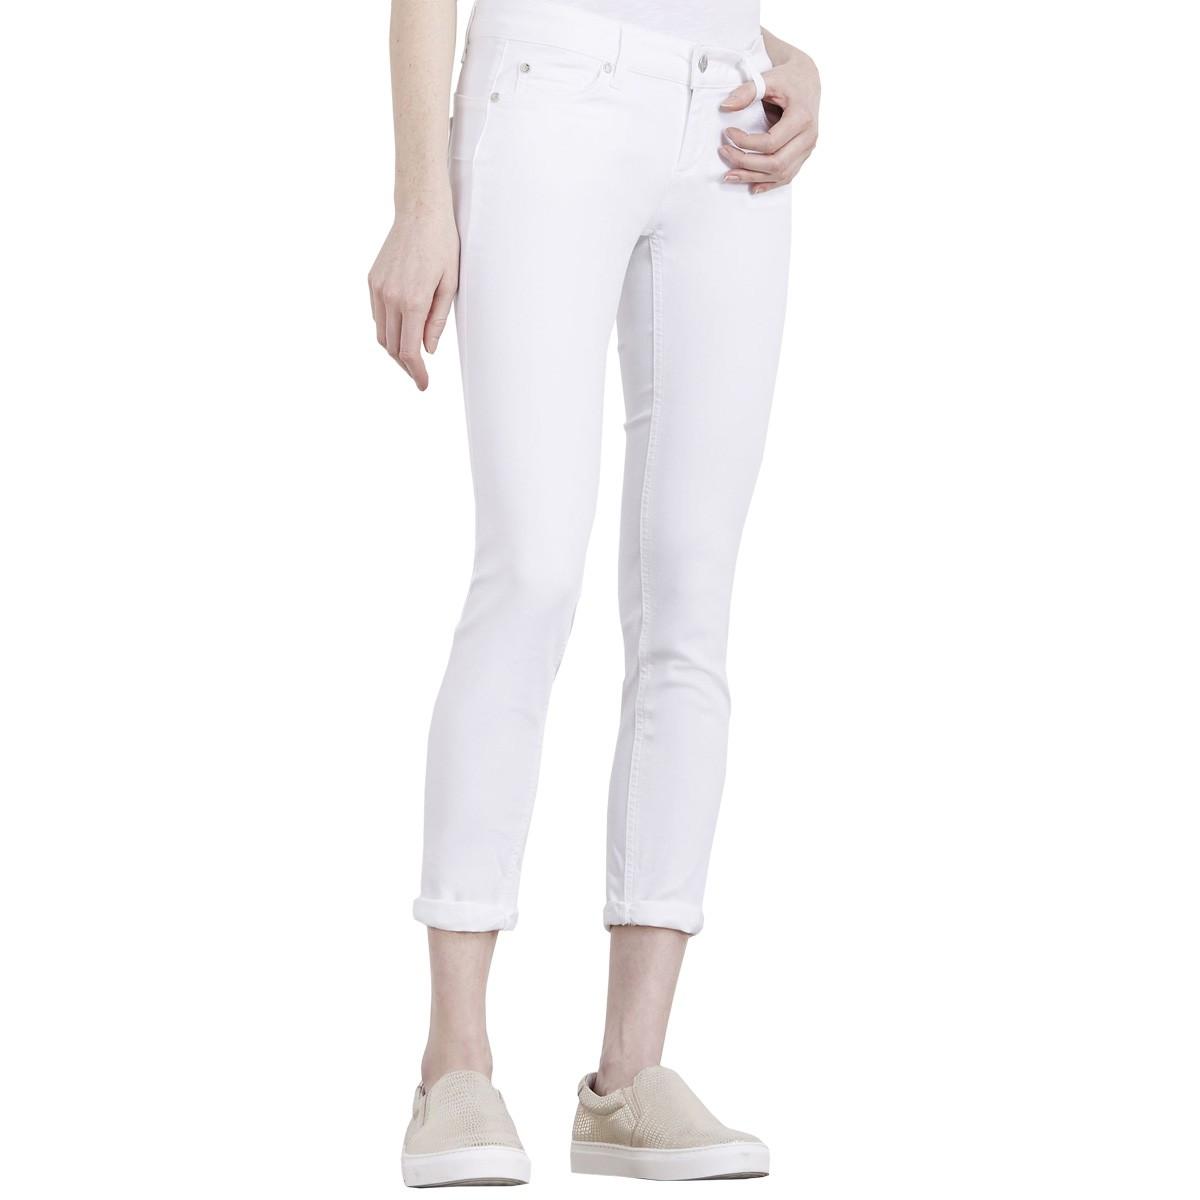 Apretar Panorama compensar  jeans liu jo bottom up standard